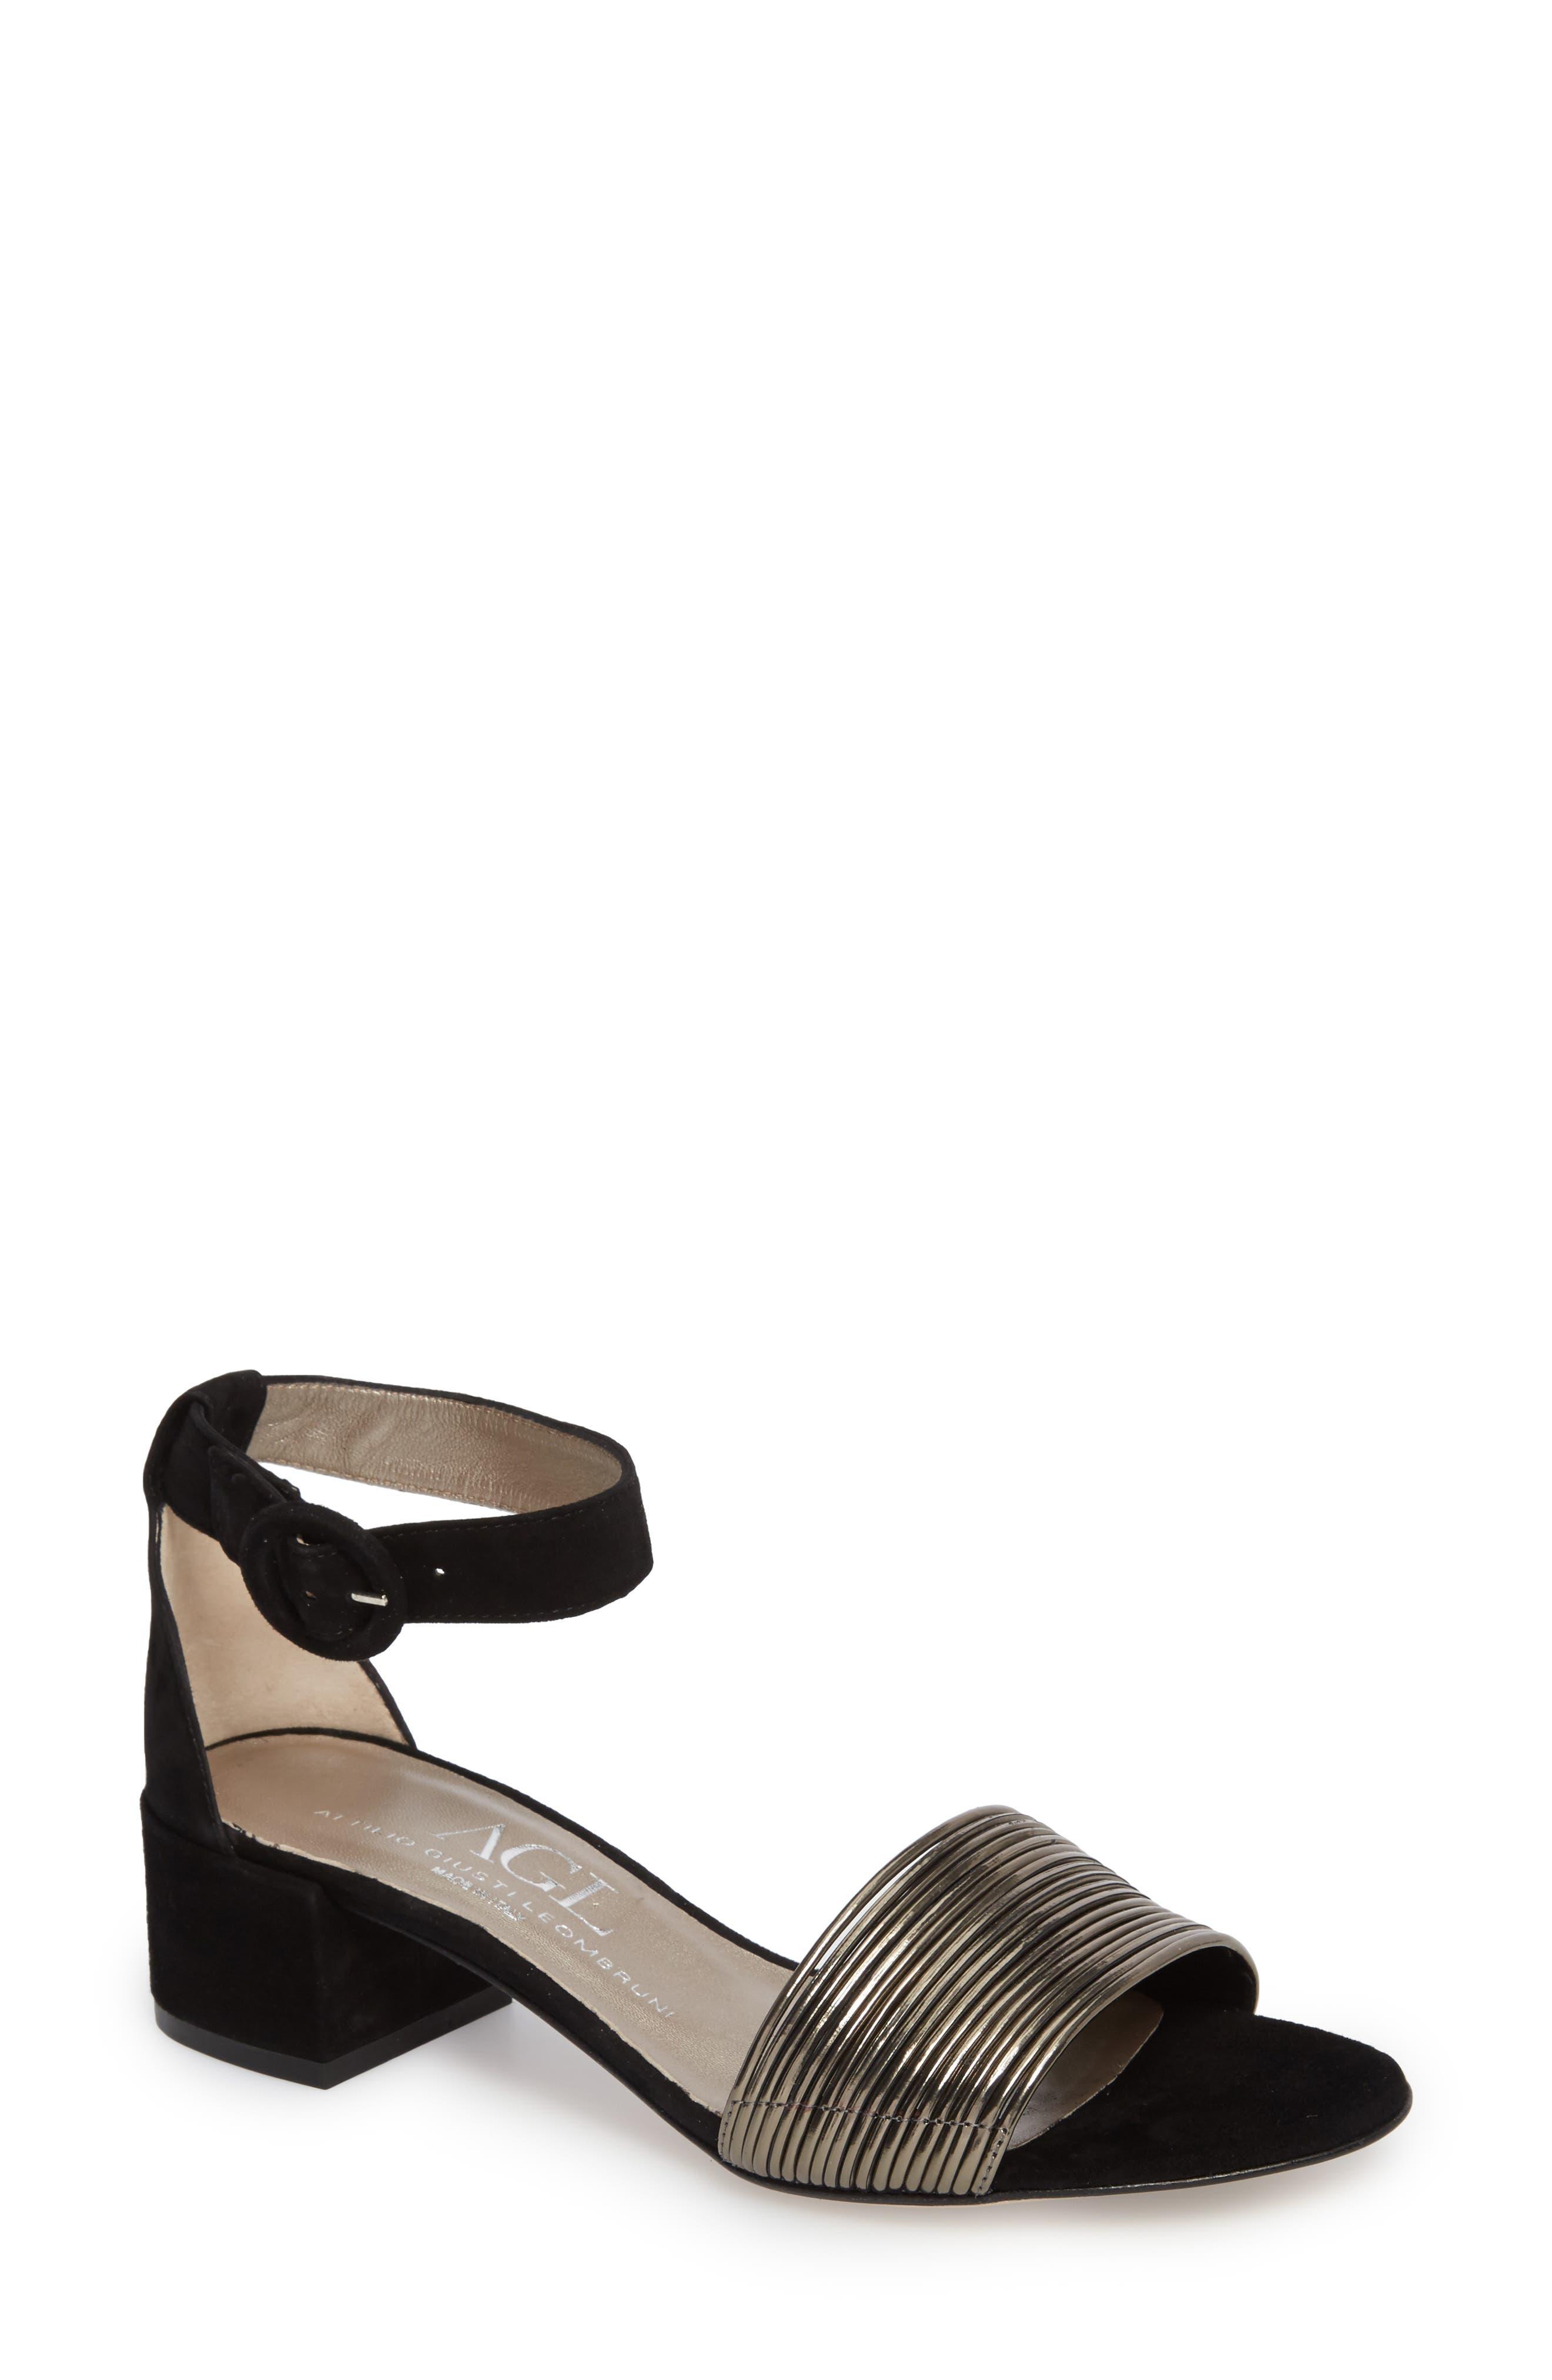 Main Image - AGL Ankle Strap Sandal (Women)